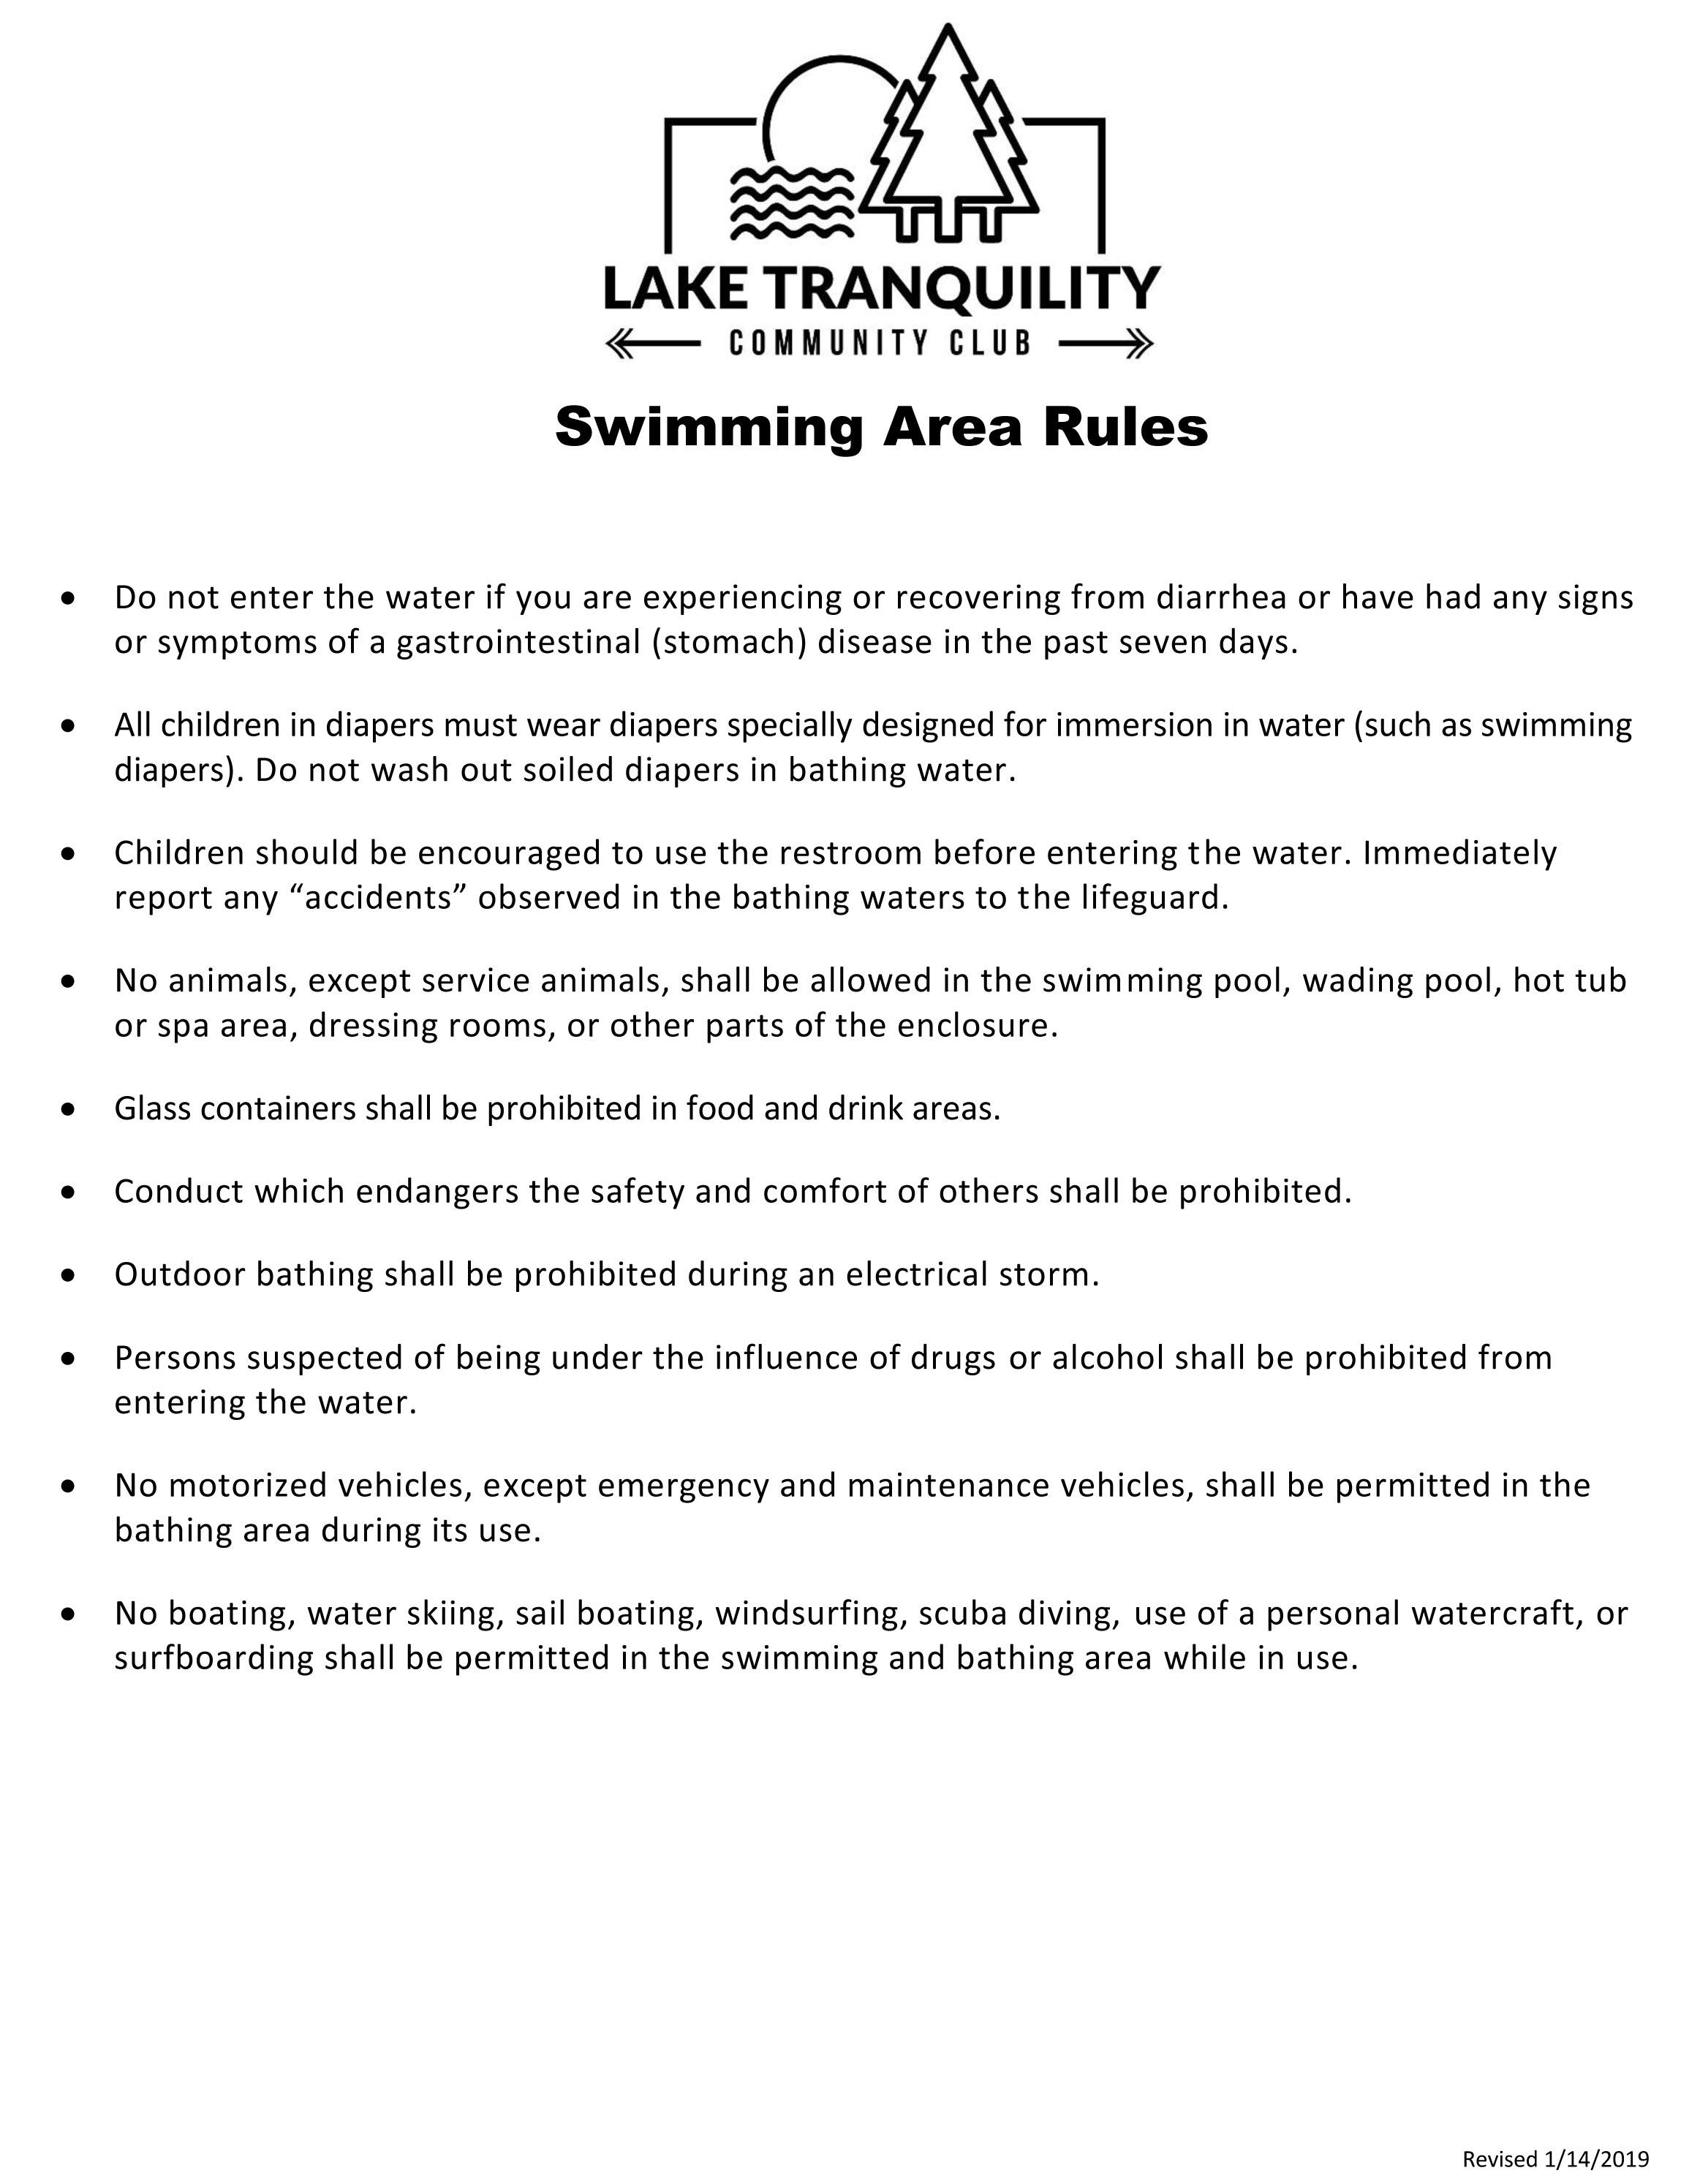 LTCC Swimming Rules.jpg